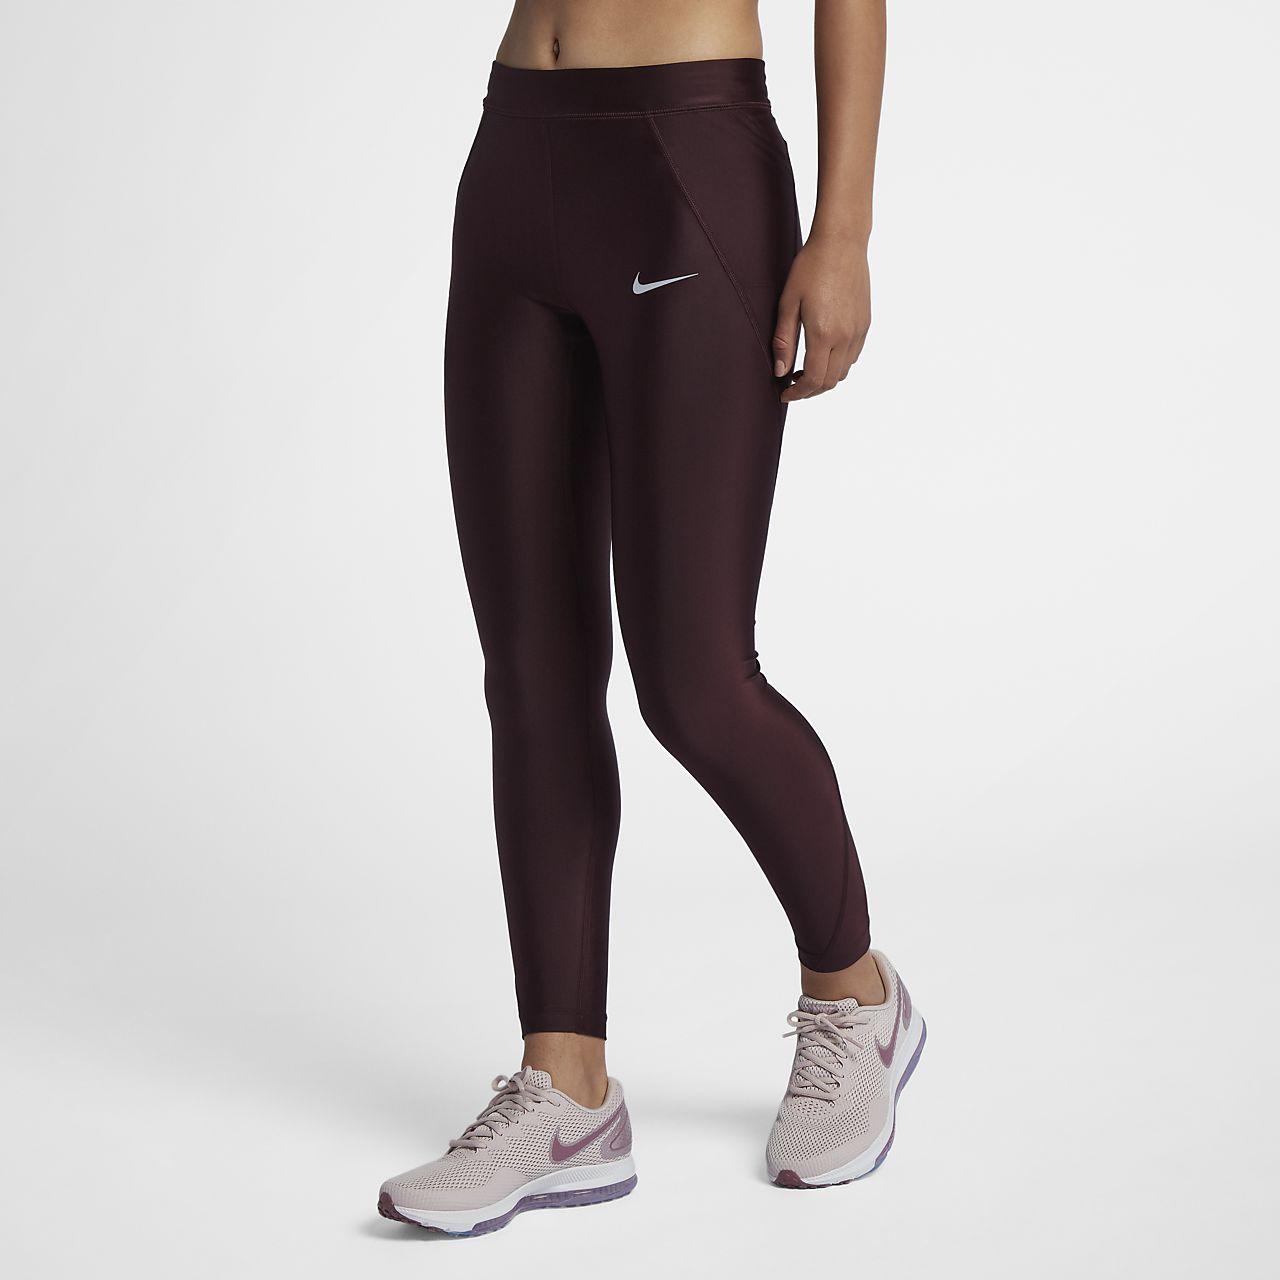 Nike Speed Women's 7/8 Tights